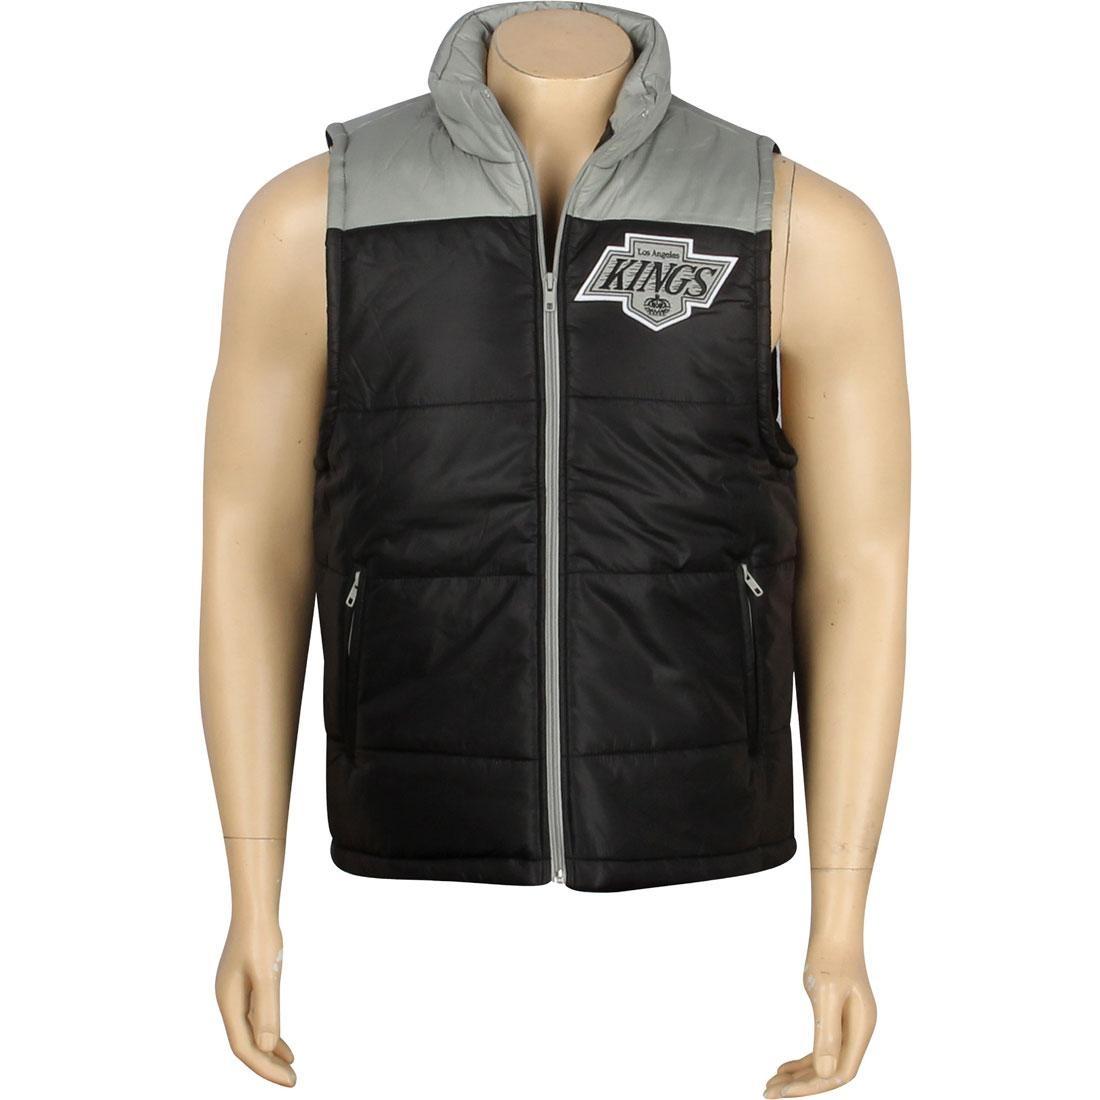 MITCHELL AND NESS キングス ベスト メンズファッション オーダーメイド ジレ メンズ 【 Los Angeles Kings Nhl Winning Vest (black) 】 Black